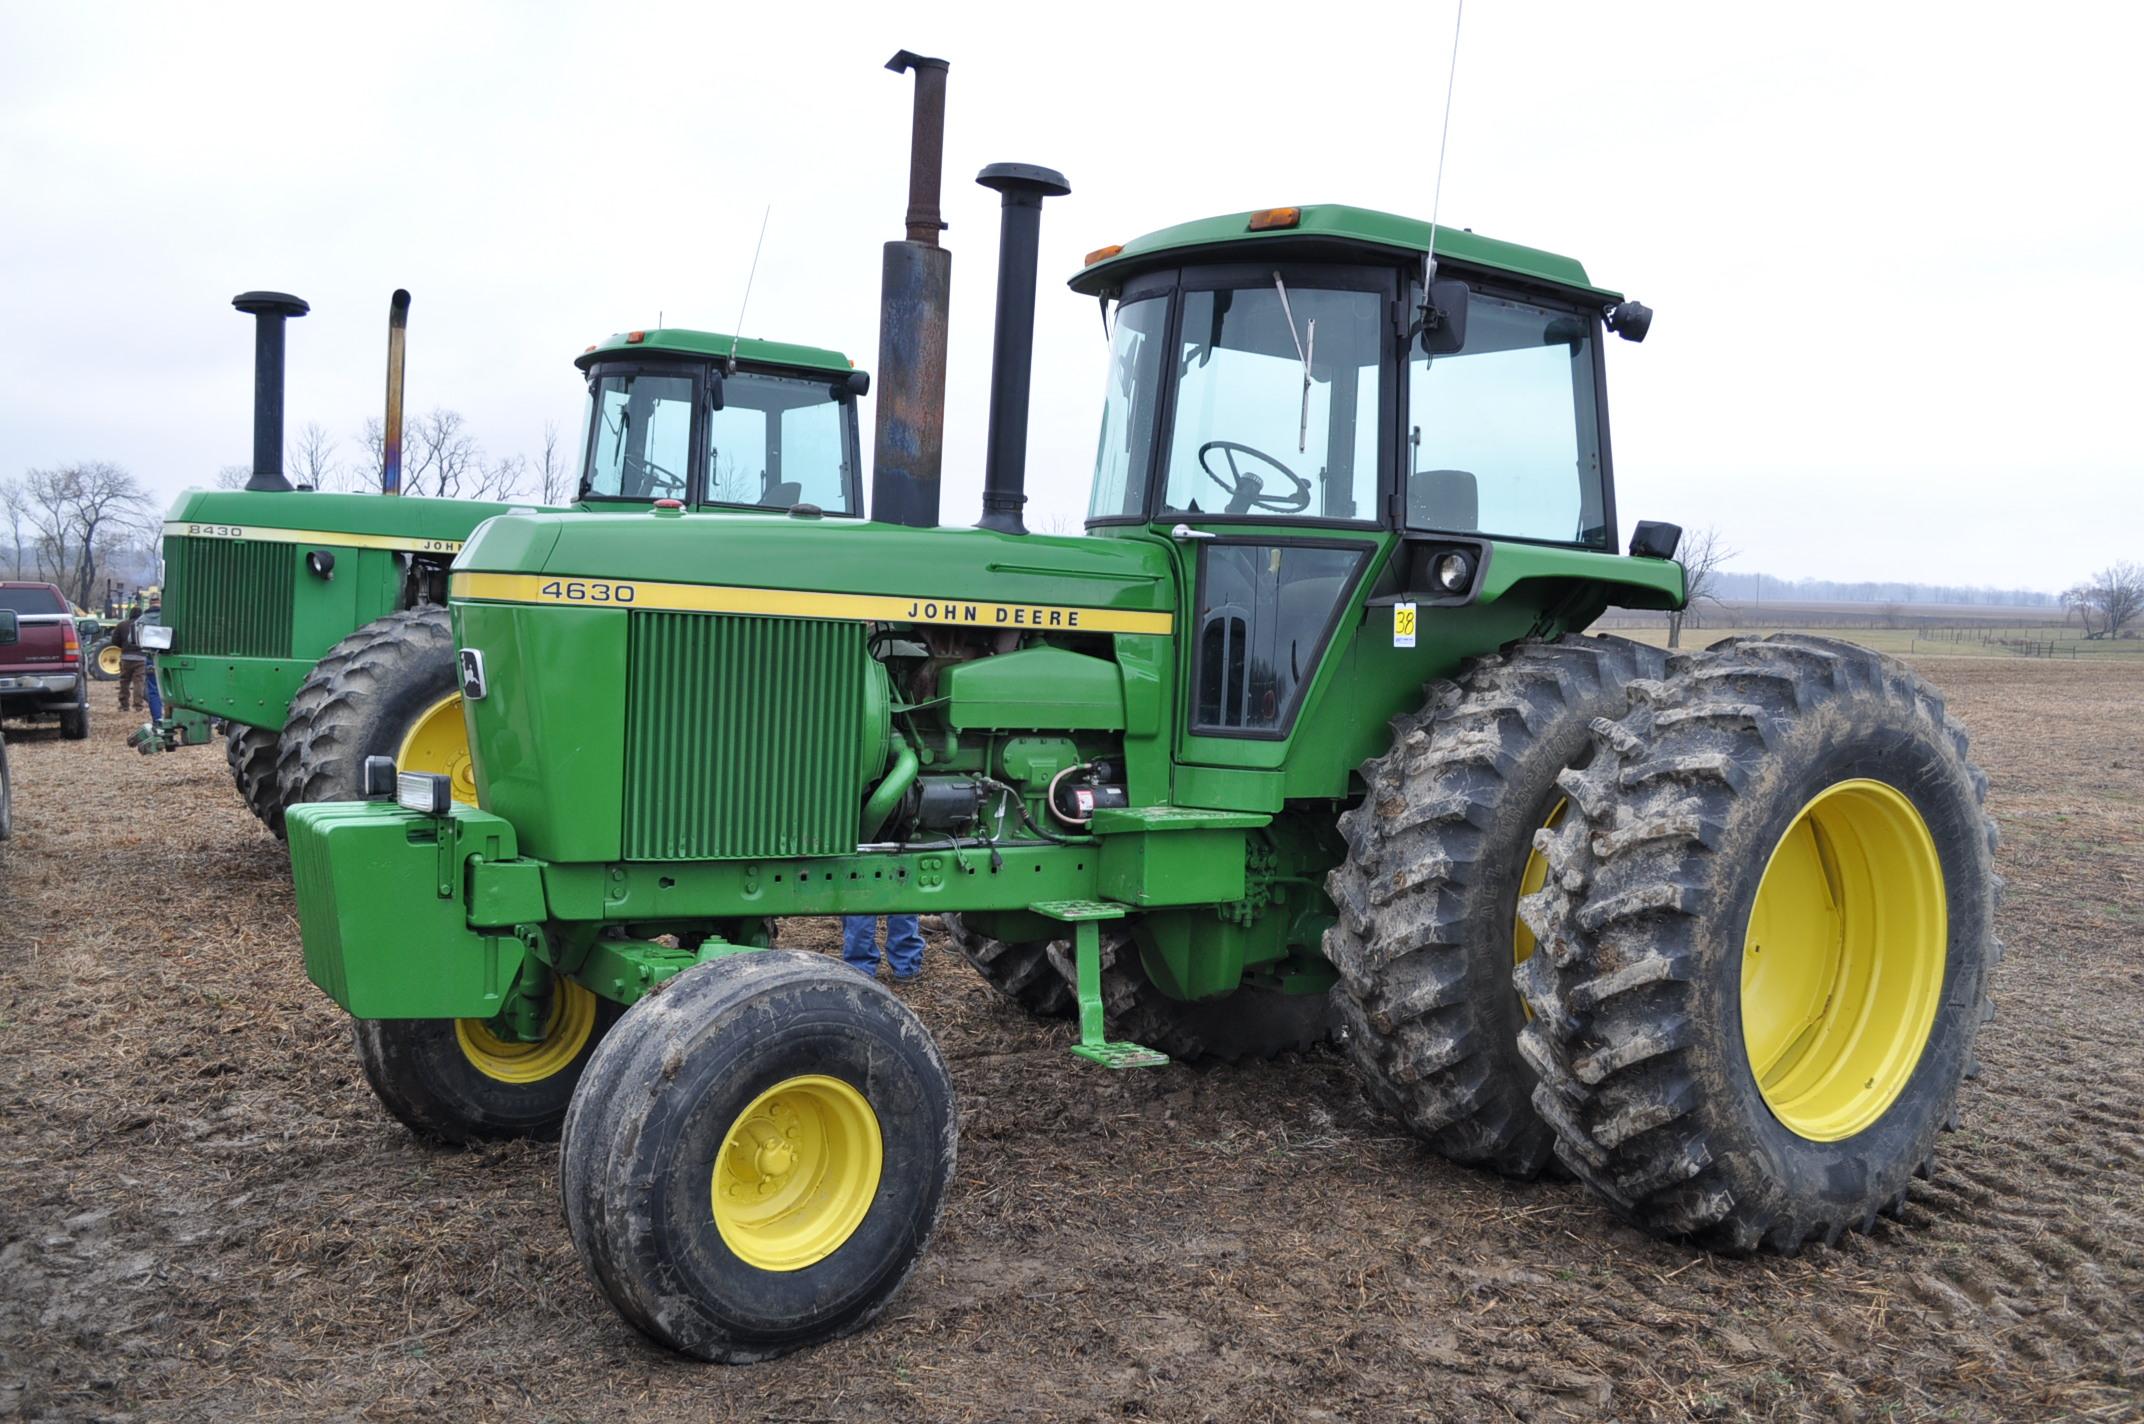 John Deere 4630 tractor, diesel, 20.8-38 hub duals, 14L-16 front, CHA, Quad range, 2 hyd remotes,